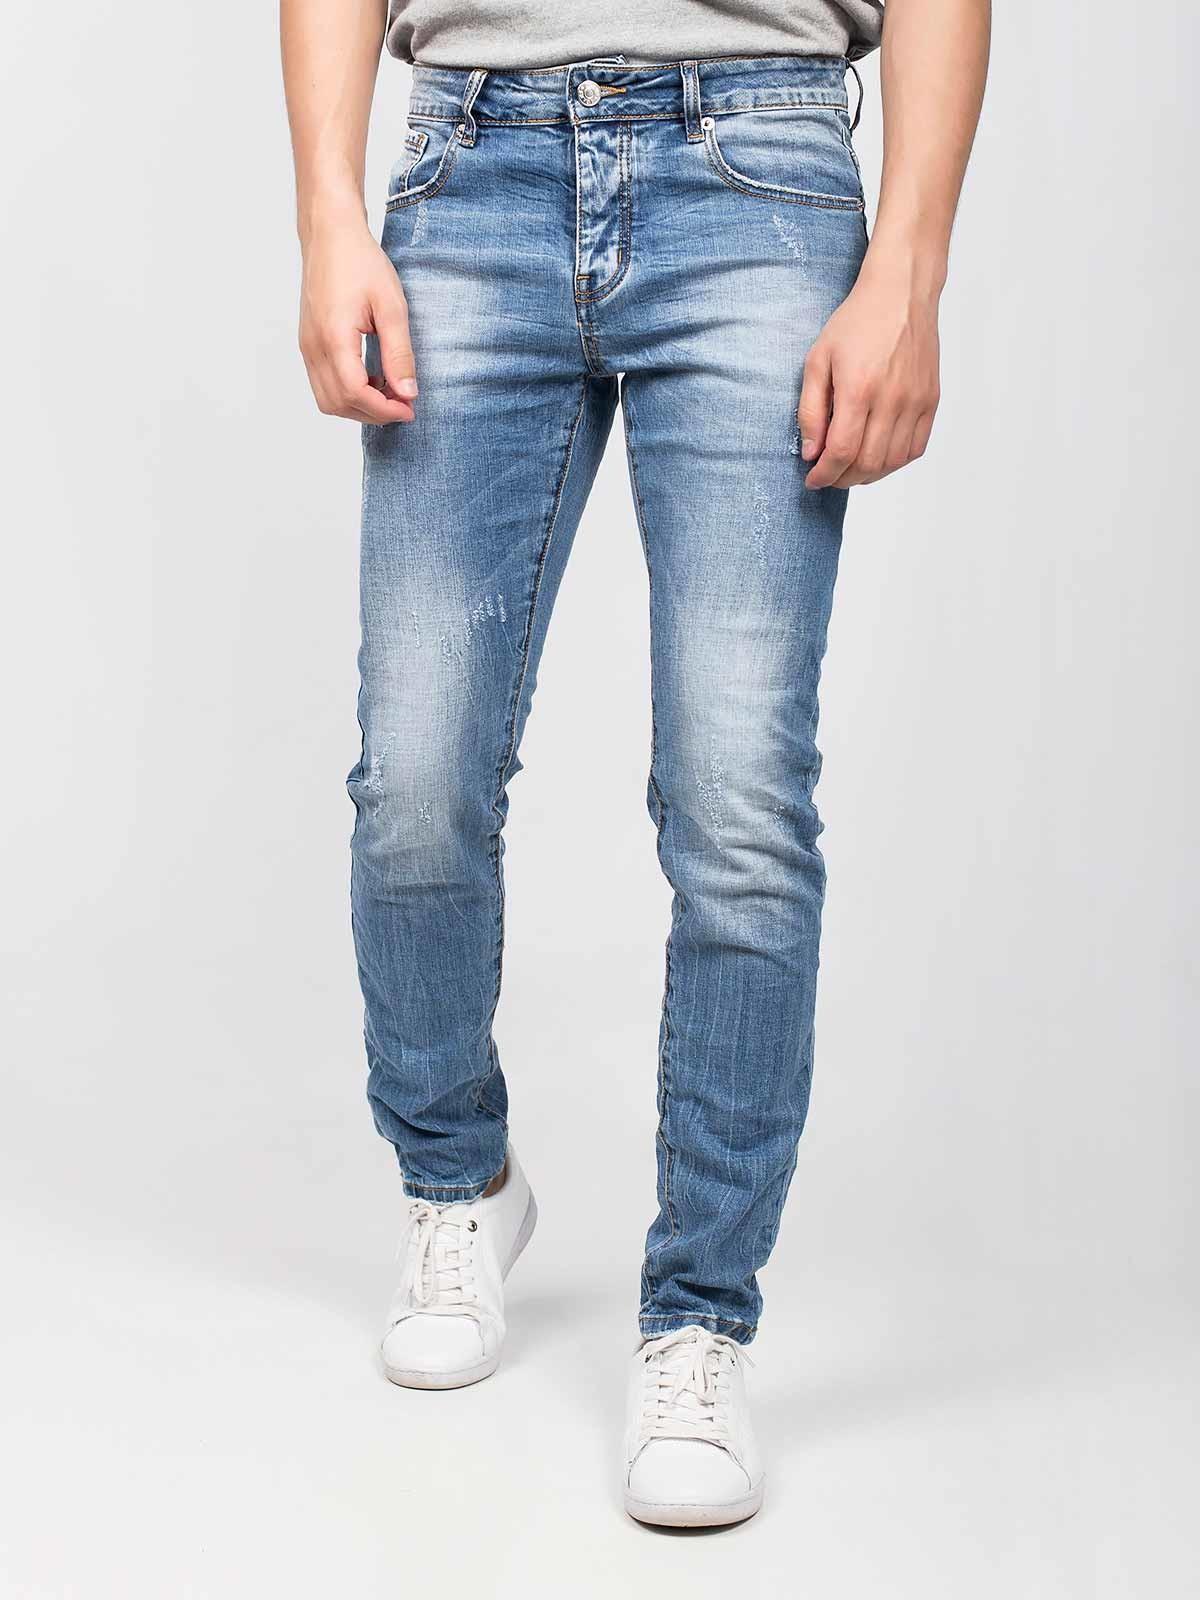 Jeans manchados